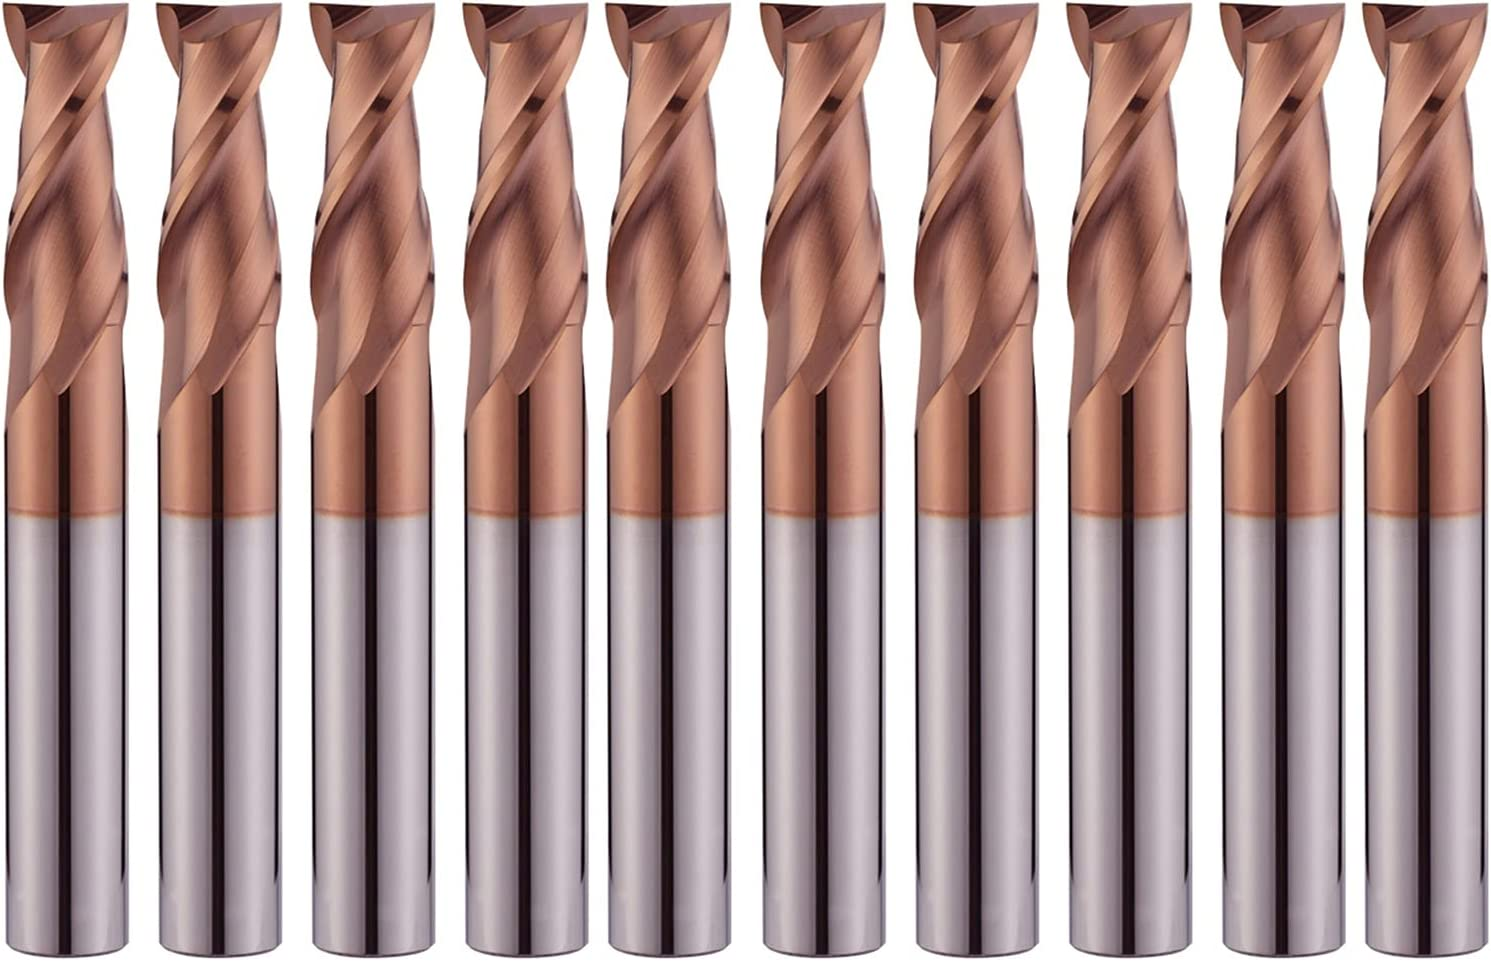 Metal 2 Flutes HRC55 Carbide End Atlanta Outstanding Mall Milling Keyseat Cut Cutter Mill